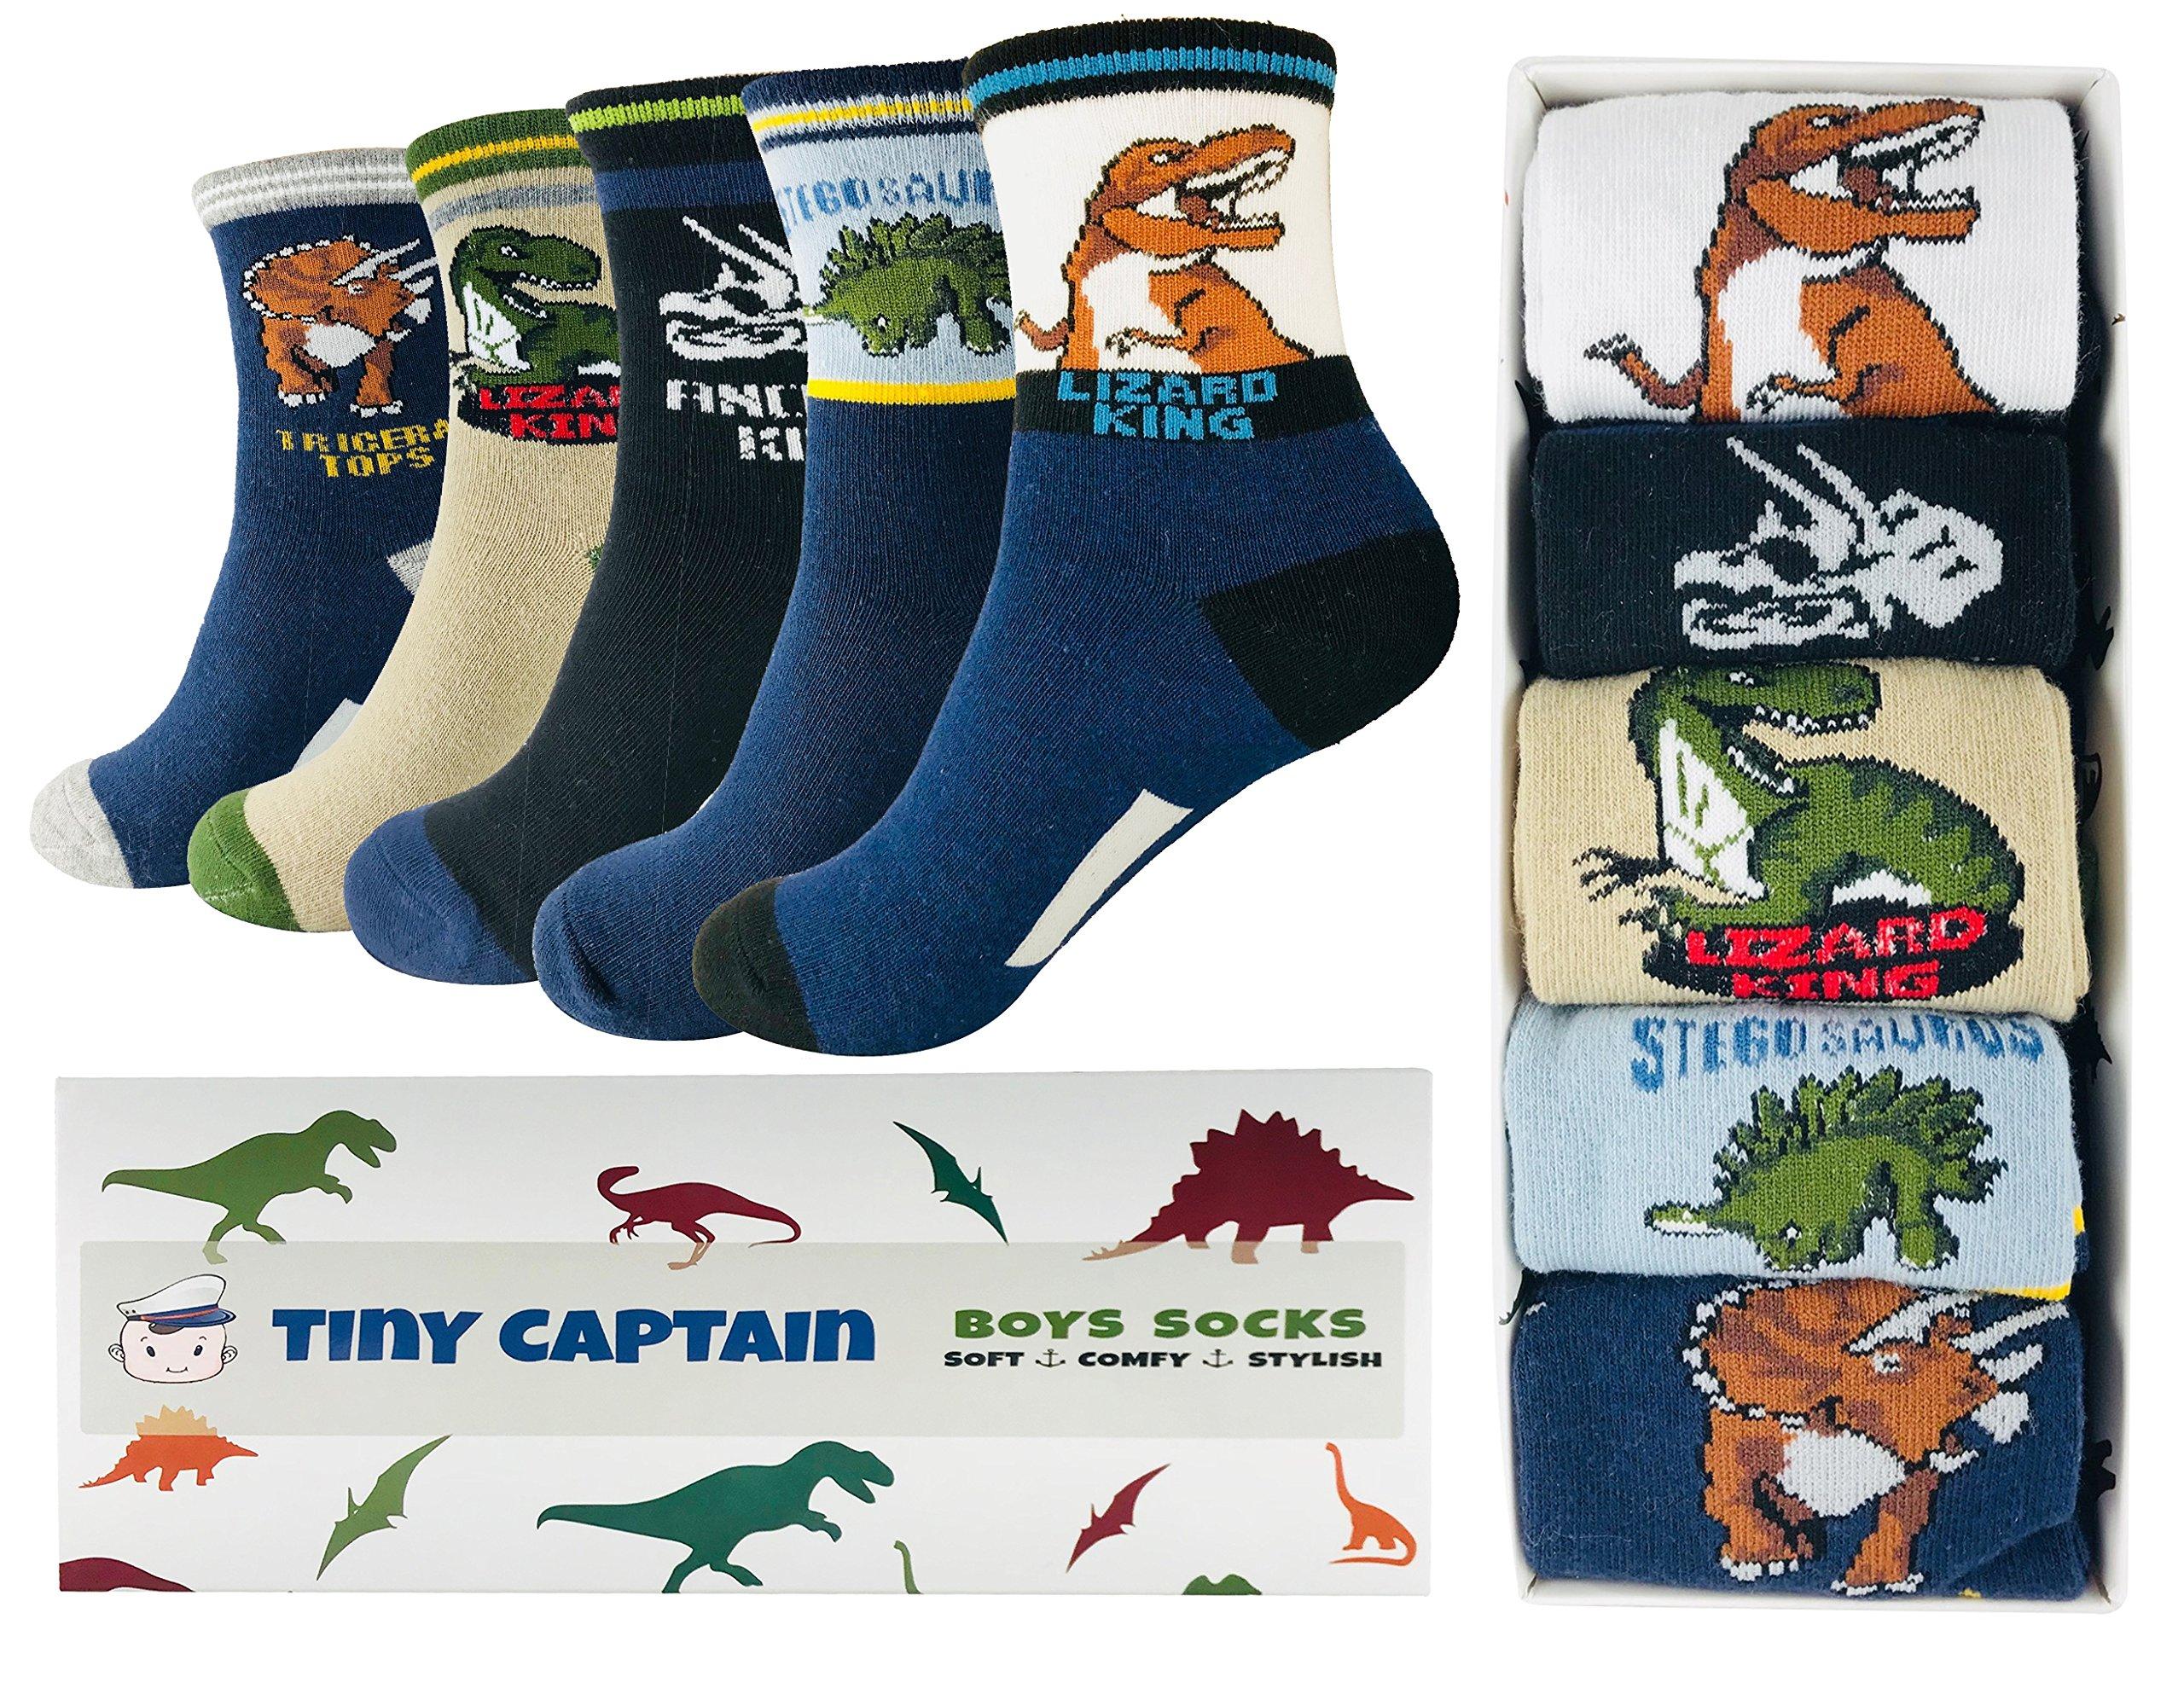 Tiny Captain Boy Dinosaur Socks 4-7 Year Old Boys Crew Cotton Sock Perfect Age 5 Gift Set (Medium, Black and Blue)